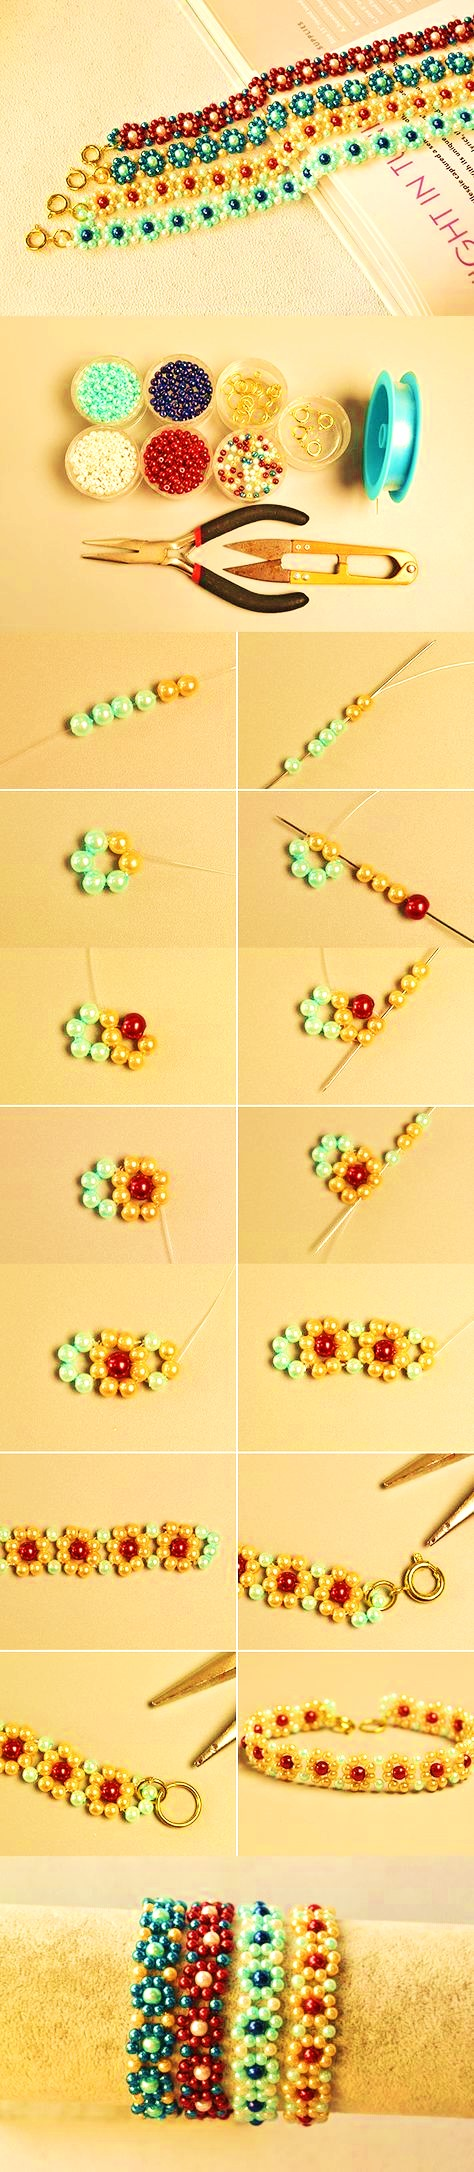 manillas con mullo brazalete mostacilla beads diy bisuteria paso a paso gratis tutorial